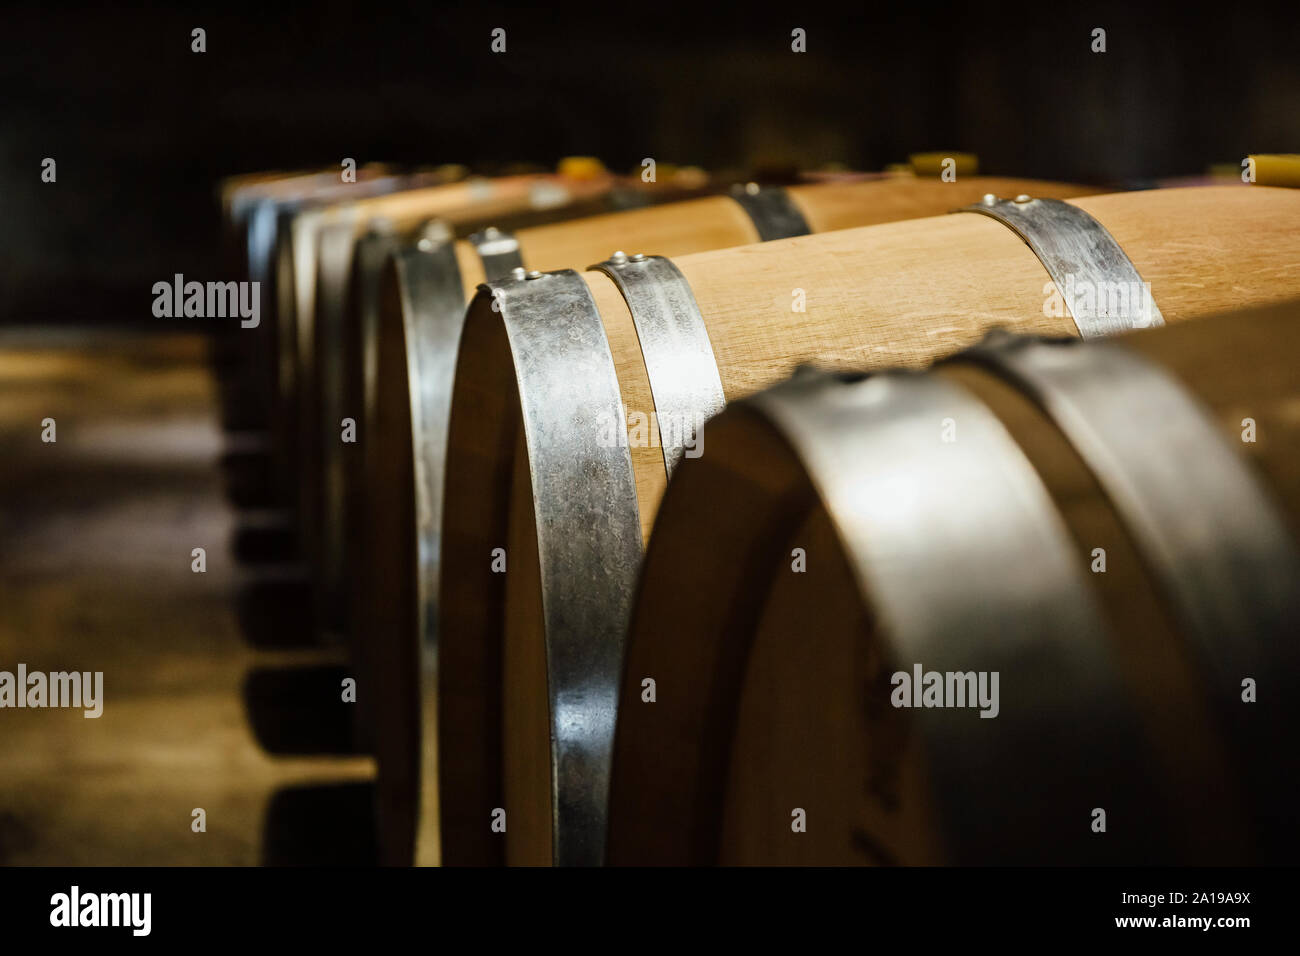 Alineado barriles de vino en una bodega Foto de stock